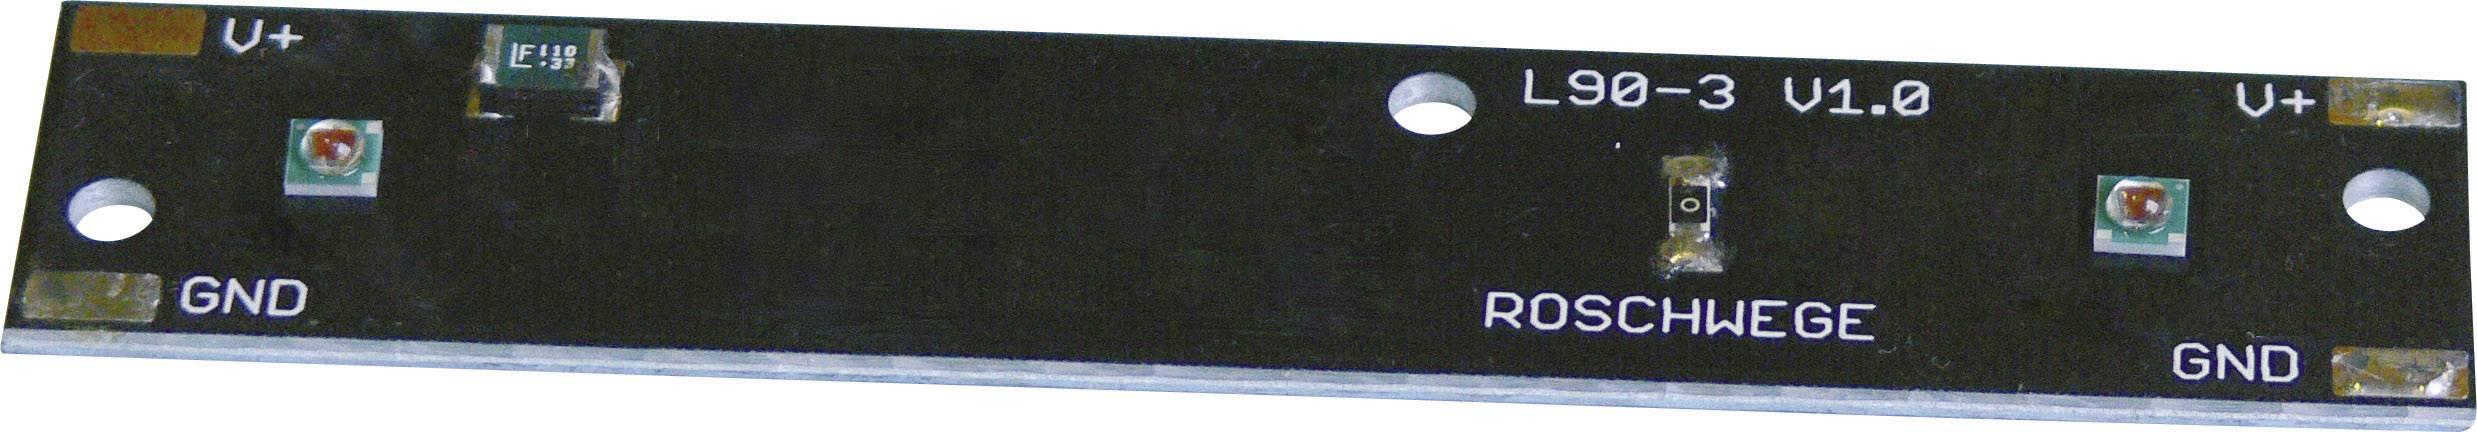 HighPower LED-lišta Roschwege 200 lm, neutrálne biela